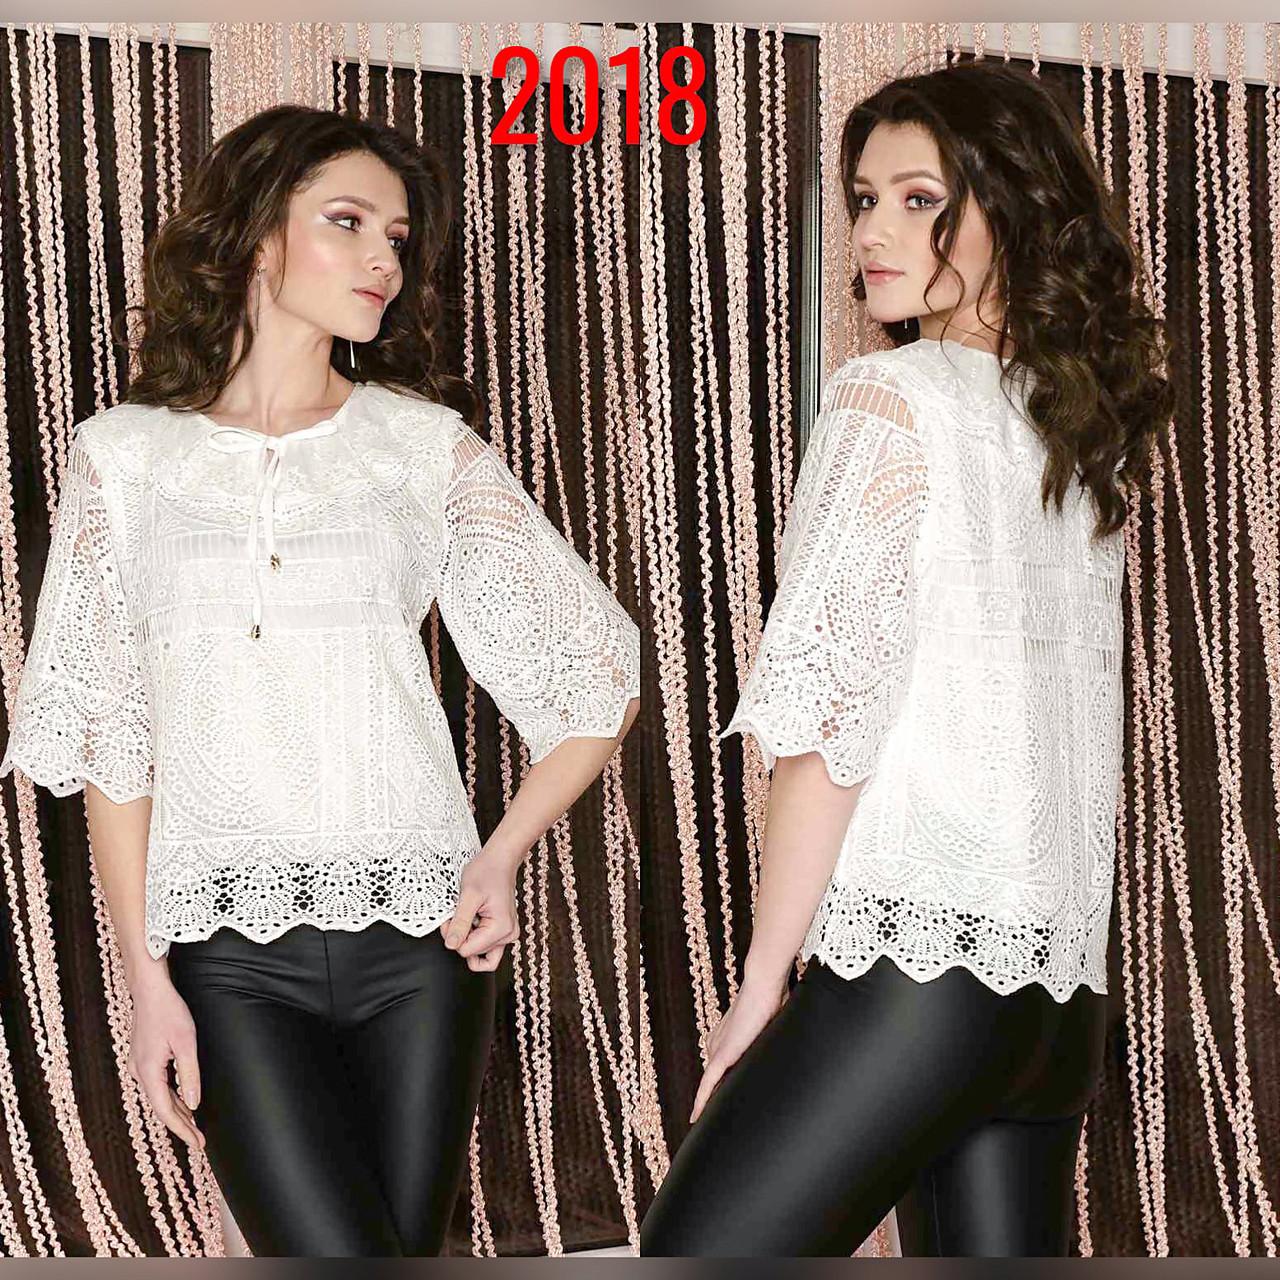 Кружевная блузка с расклешенным рукавом 42-44 (в расцветках)